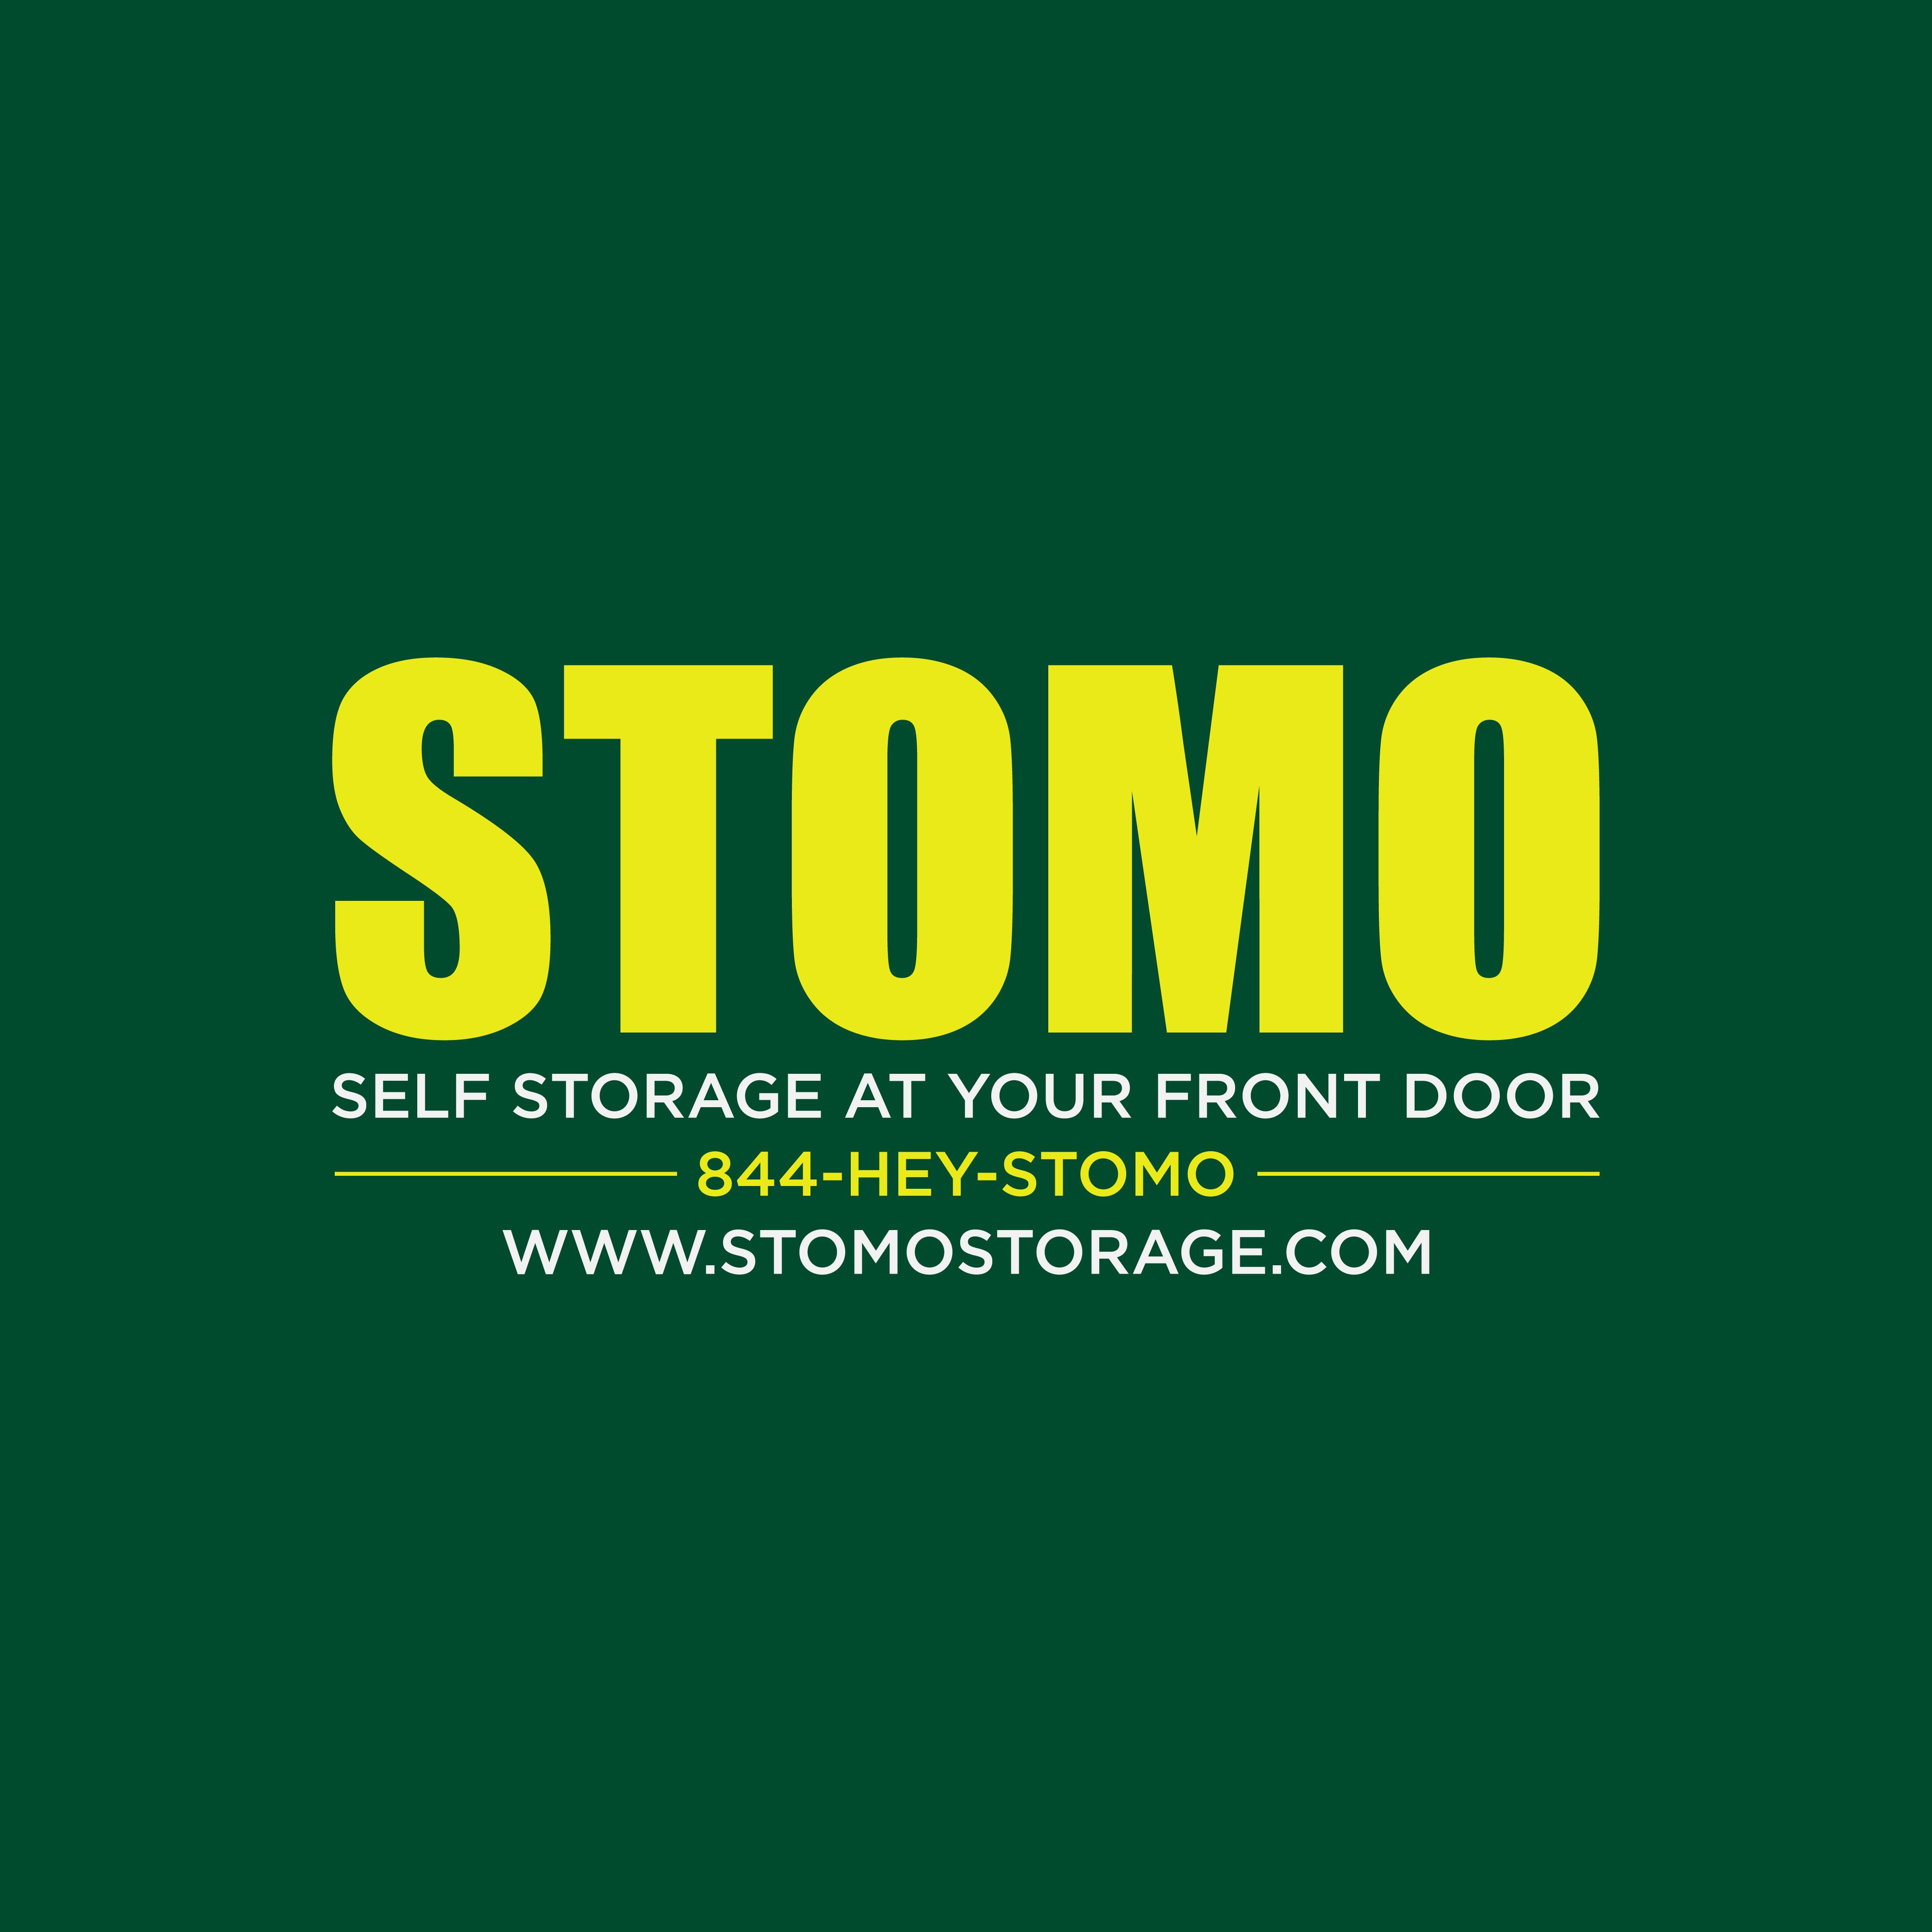 Stomo Mobile Self Storage image 8